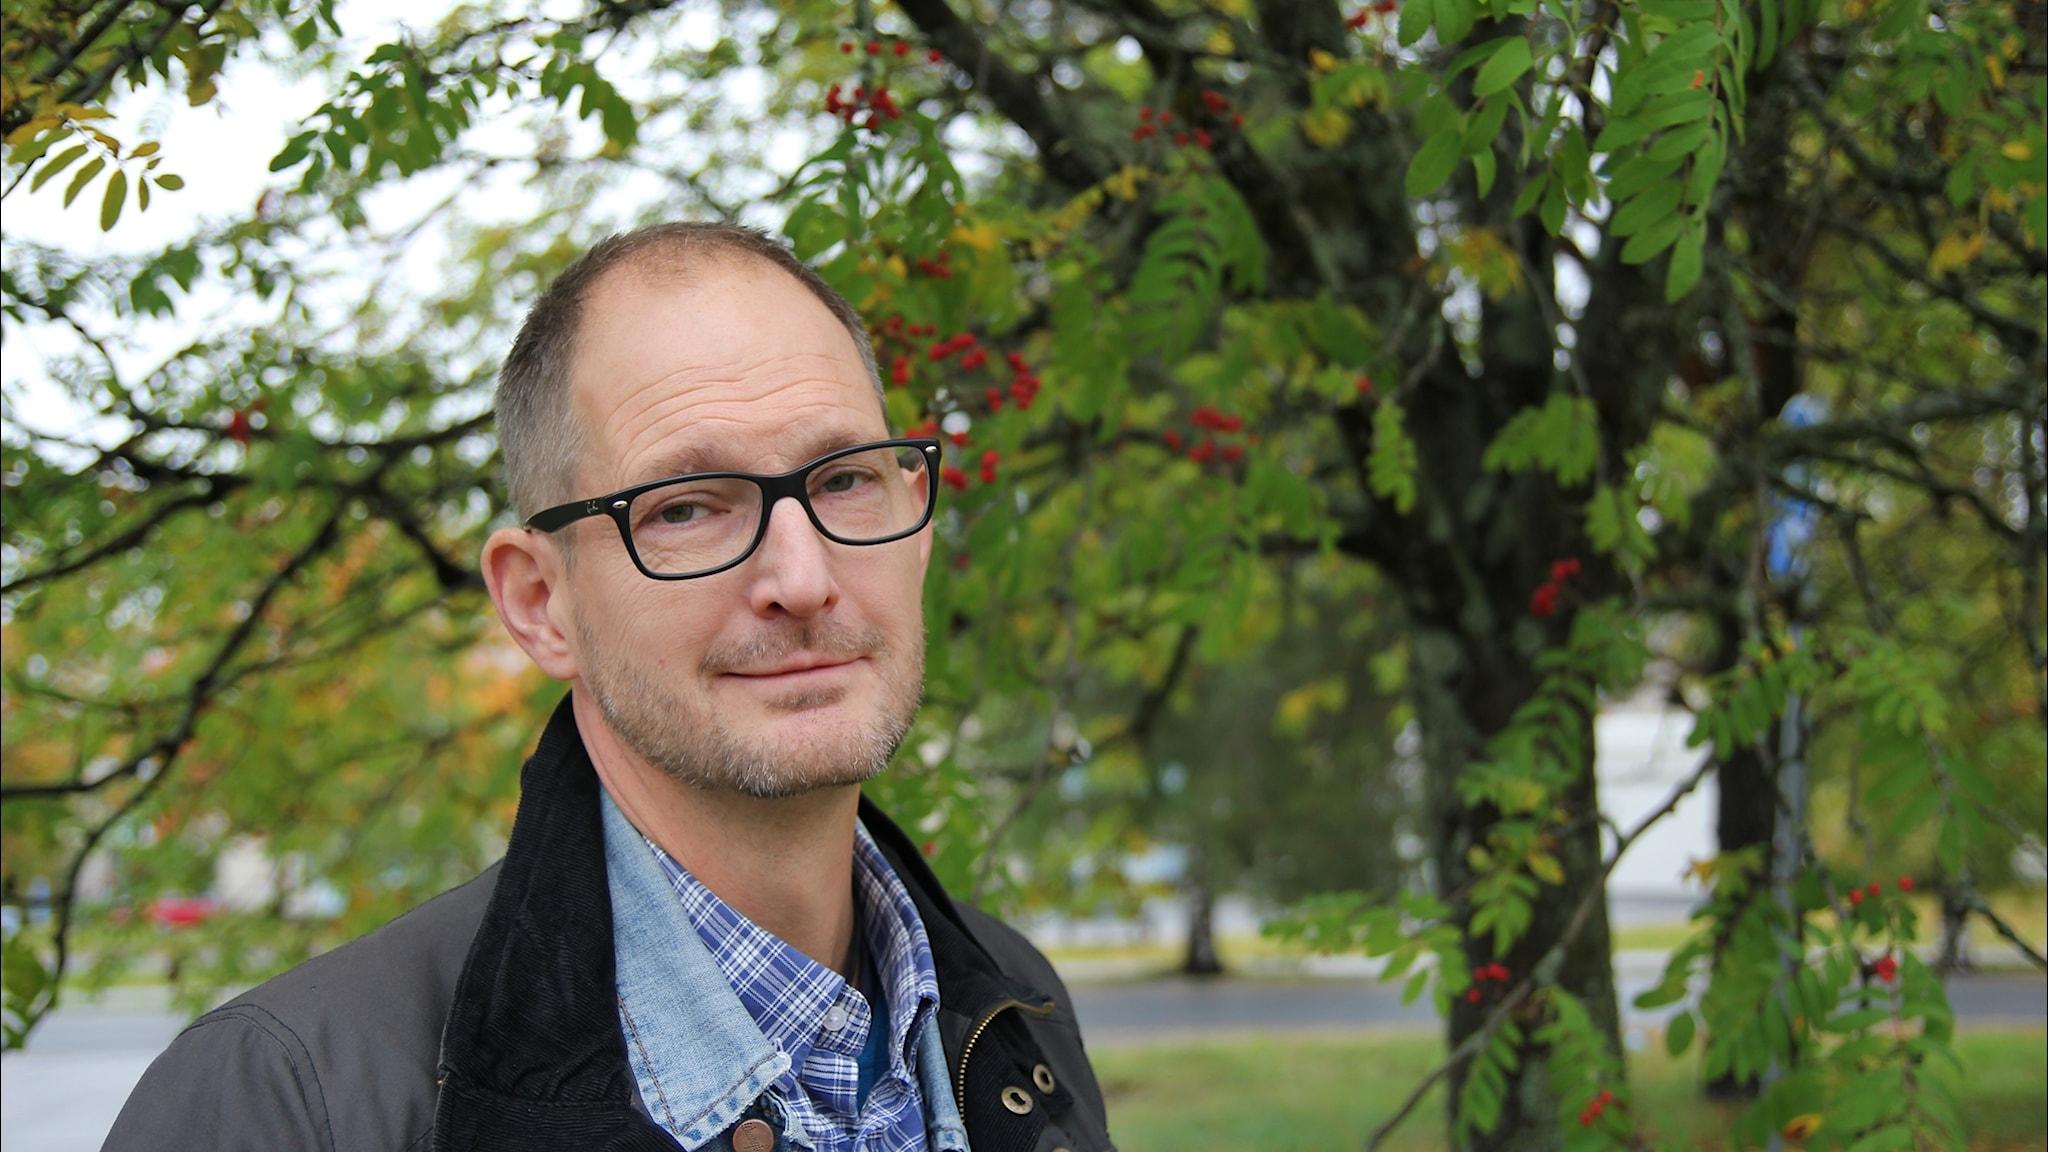 Möten med mina hjälpare - Mattias Hjalmarsson